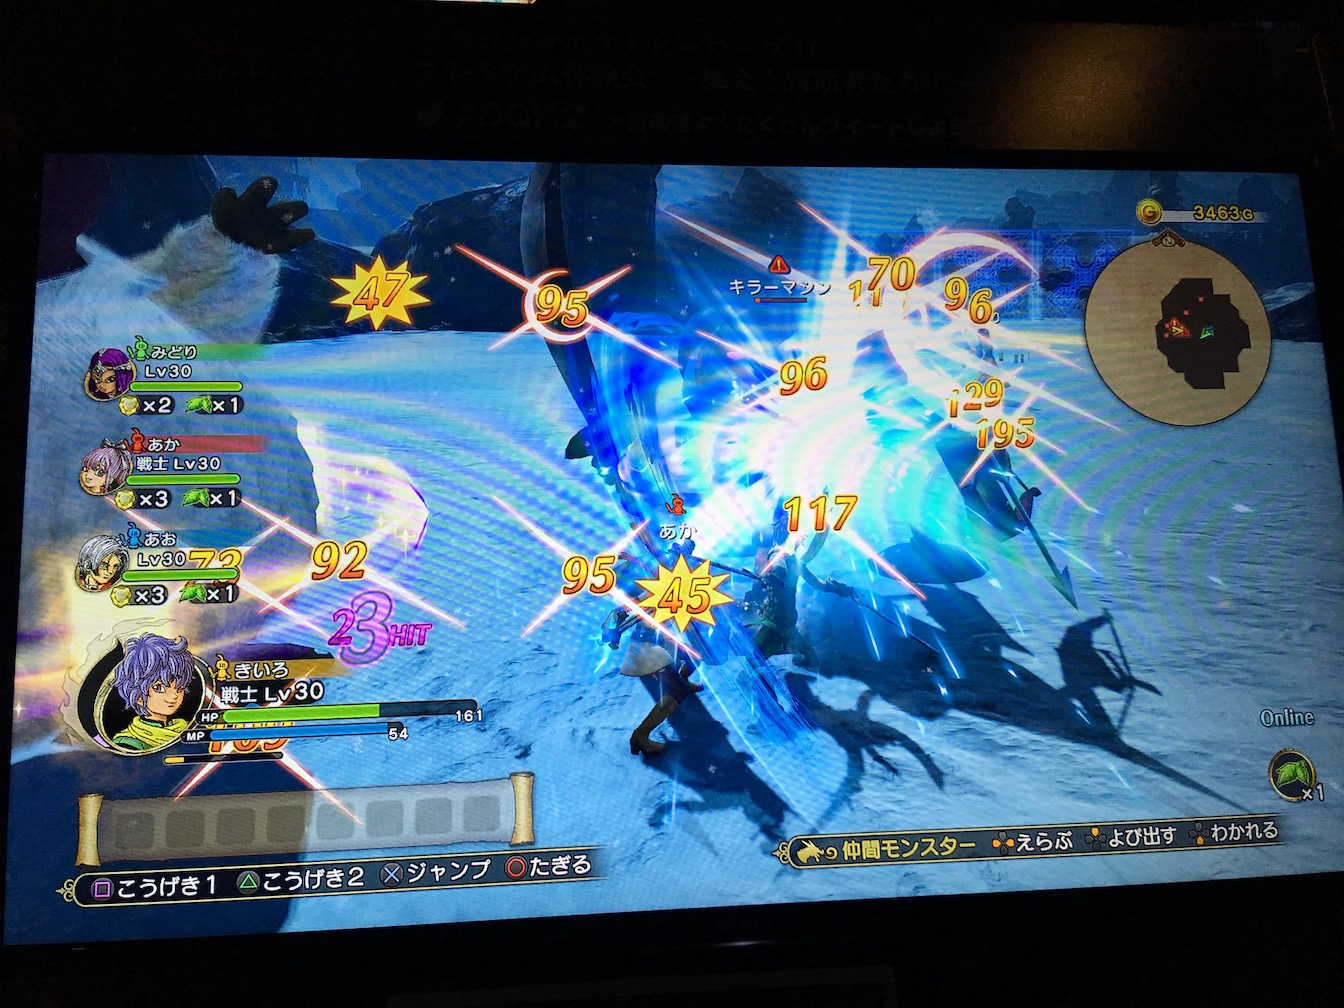 Dragon quest heros 2 premium experience meeting report 32